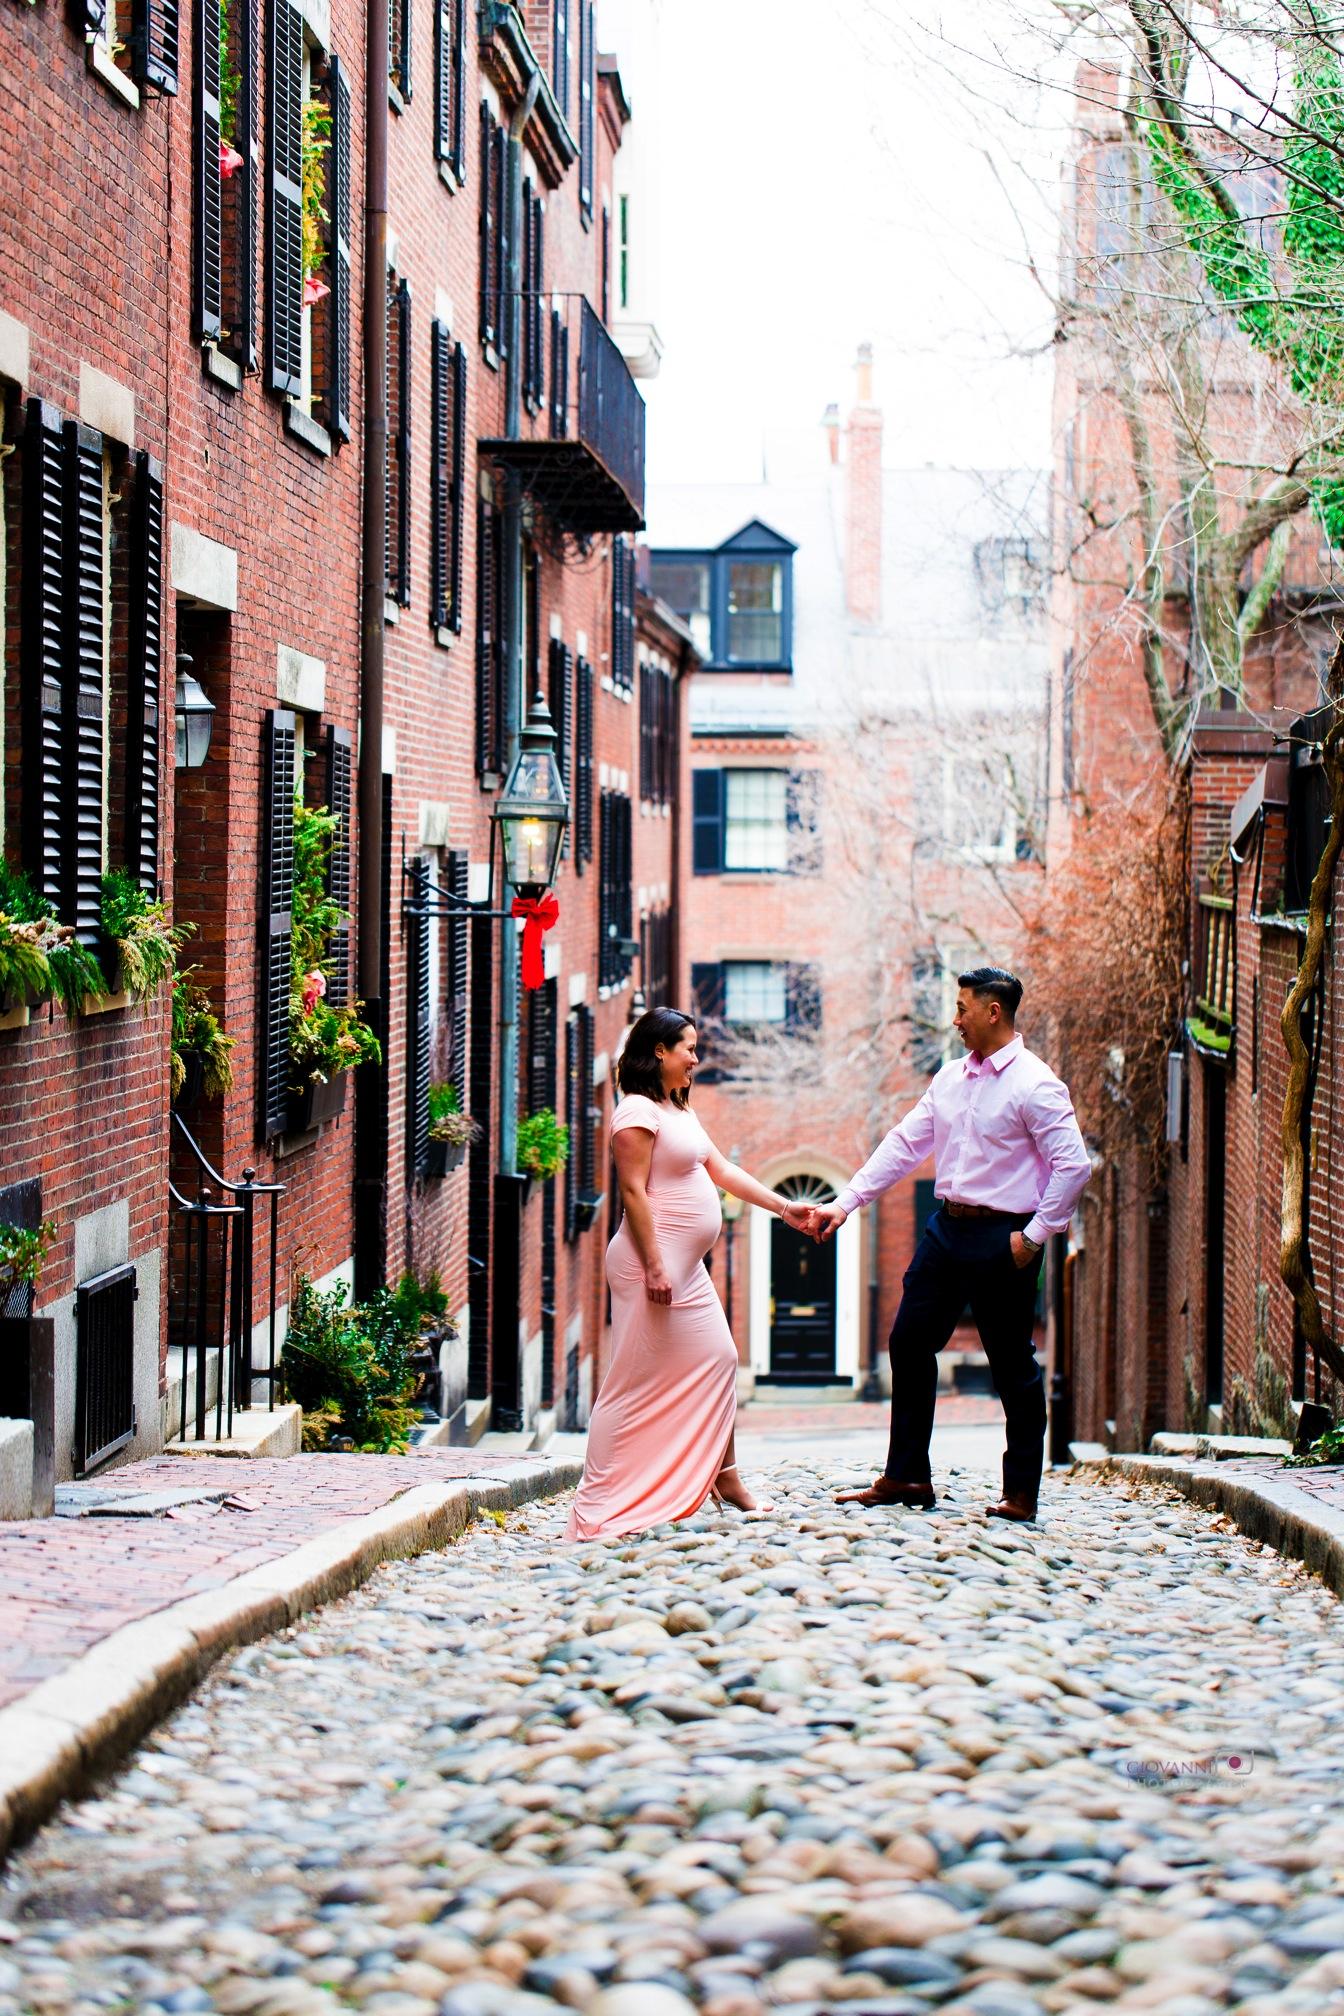 Maryanne & Steve Maternity Photo's Acorn Street Boston, MA